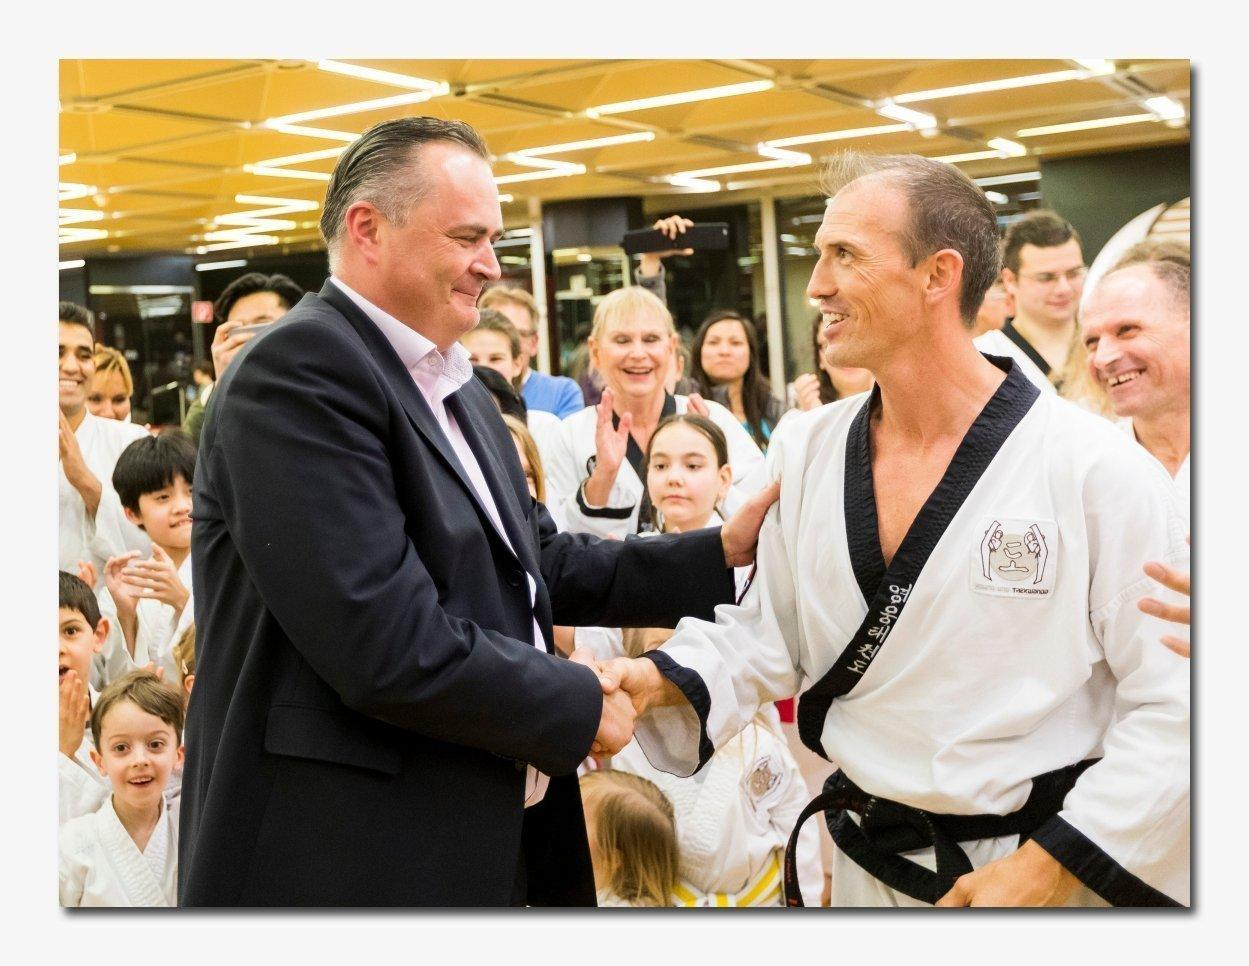 Bild zu Bundesminister Doskozil besucht Young-Ung Taekwondo